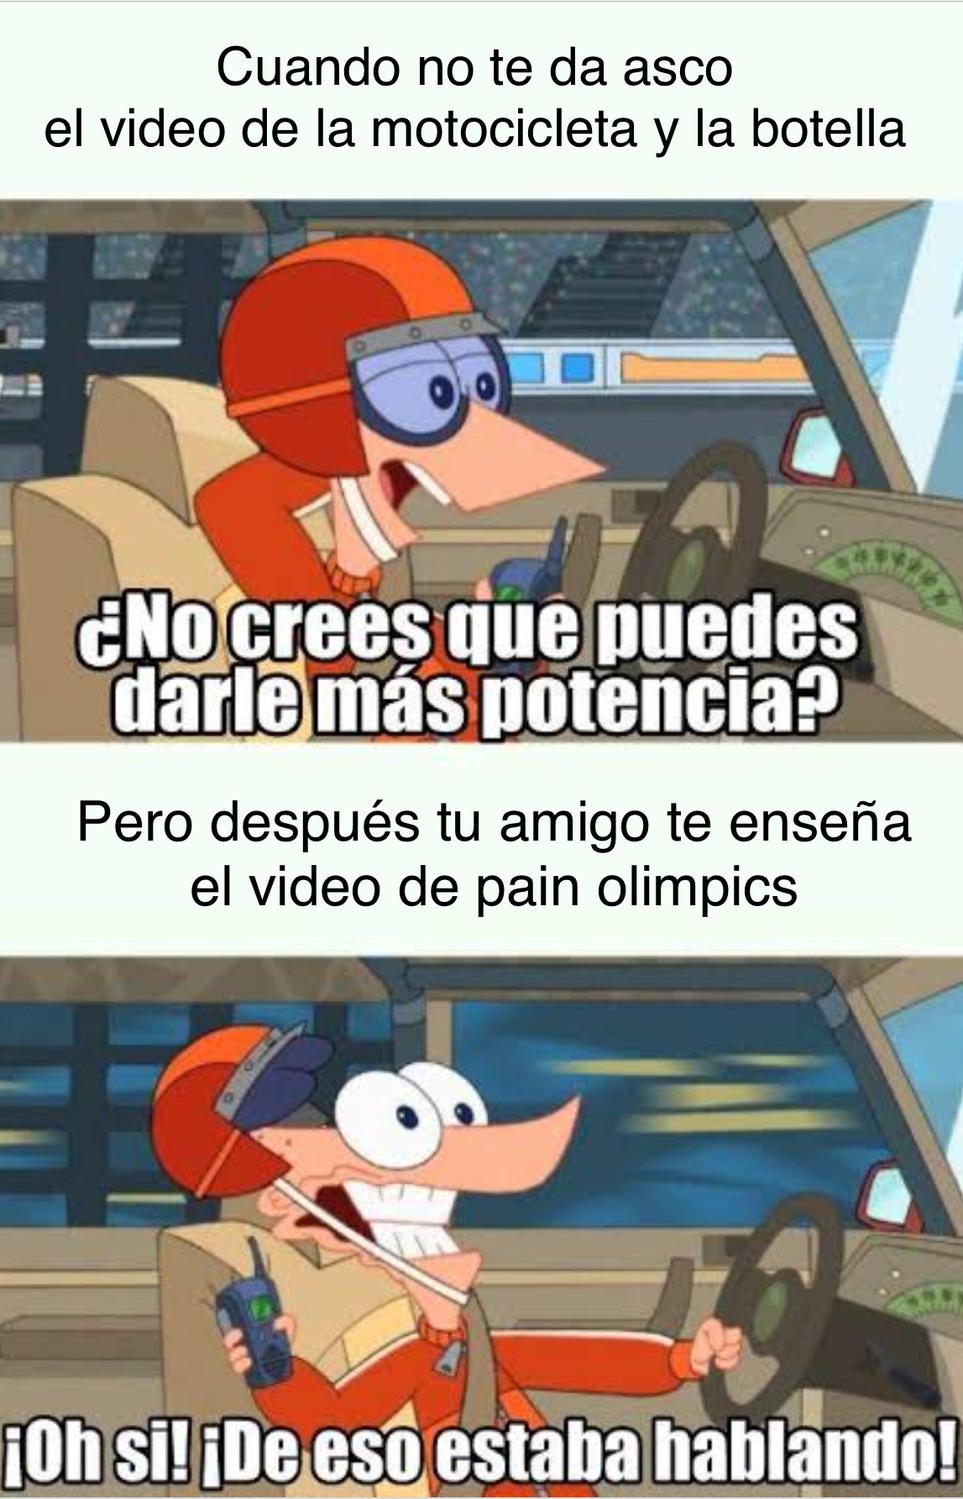 Eso a mi me paso, me traumó mas el video de pain olimpics - meme